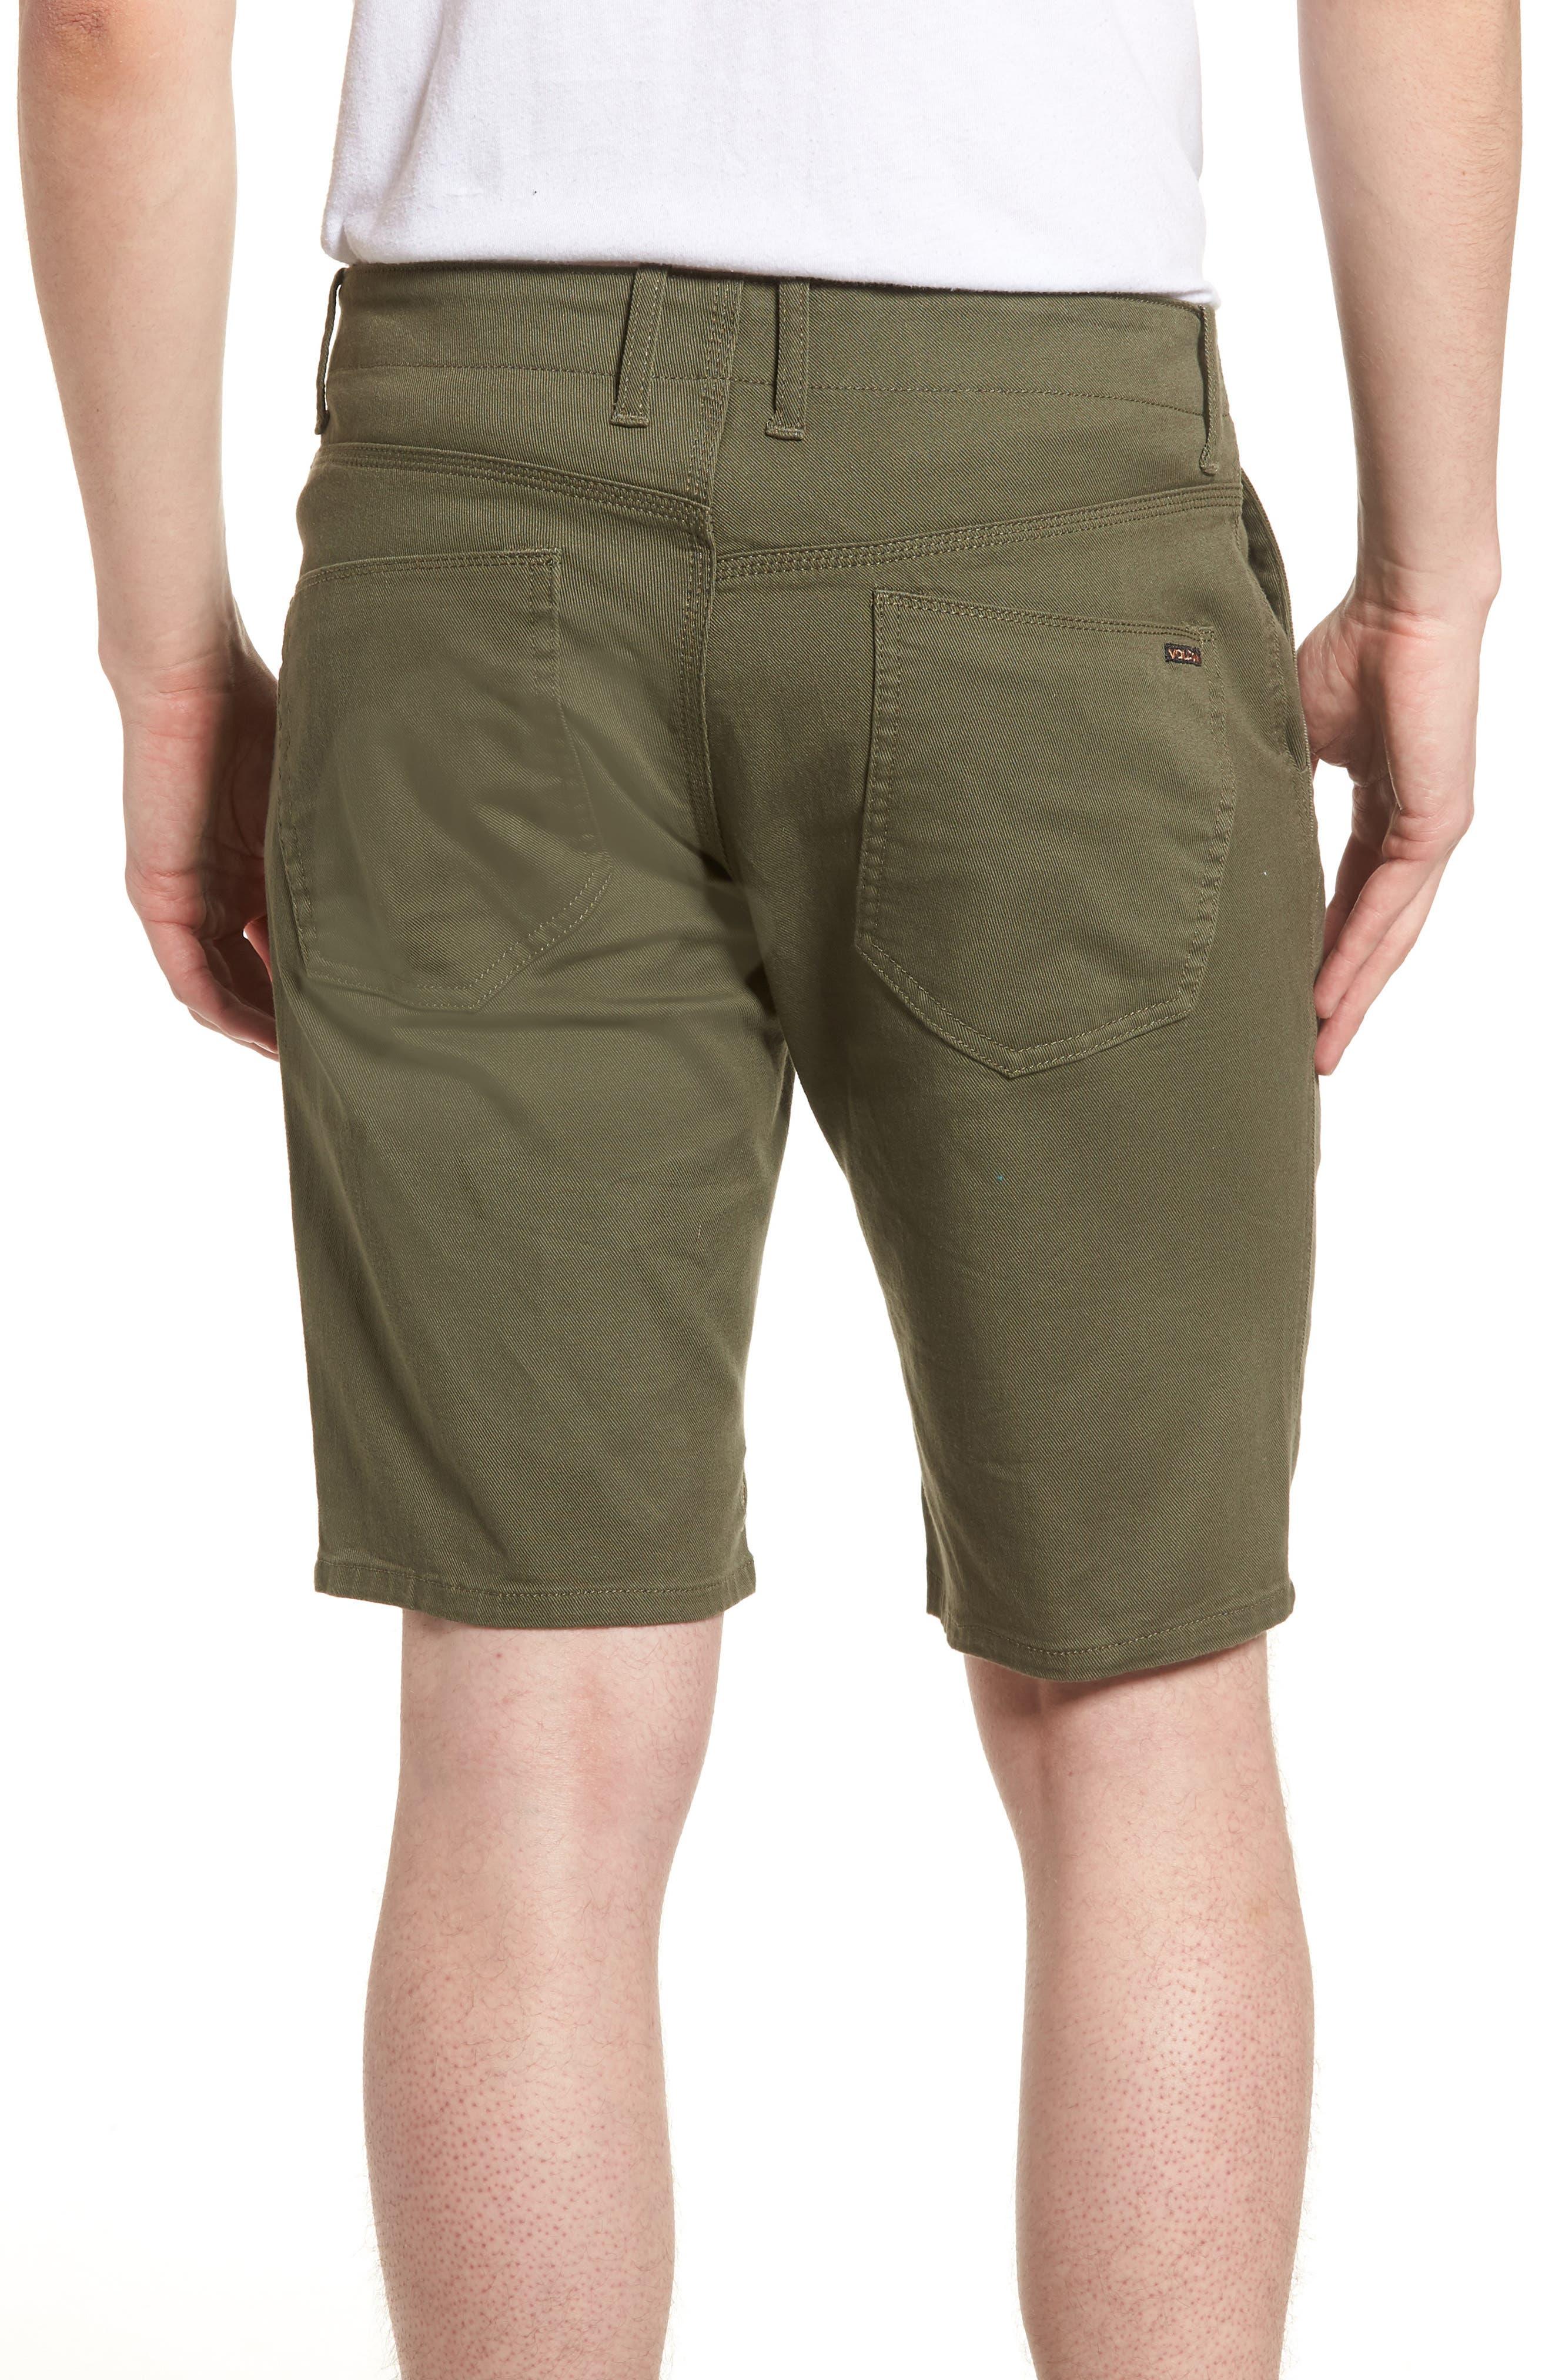 VSM Prowler Shorts,                             Alternate thumbnail 2, color,                             Military